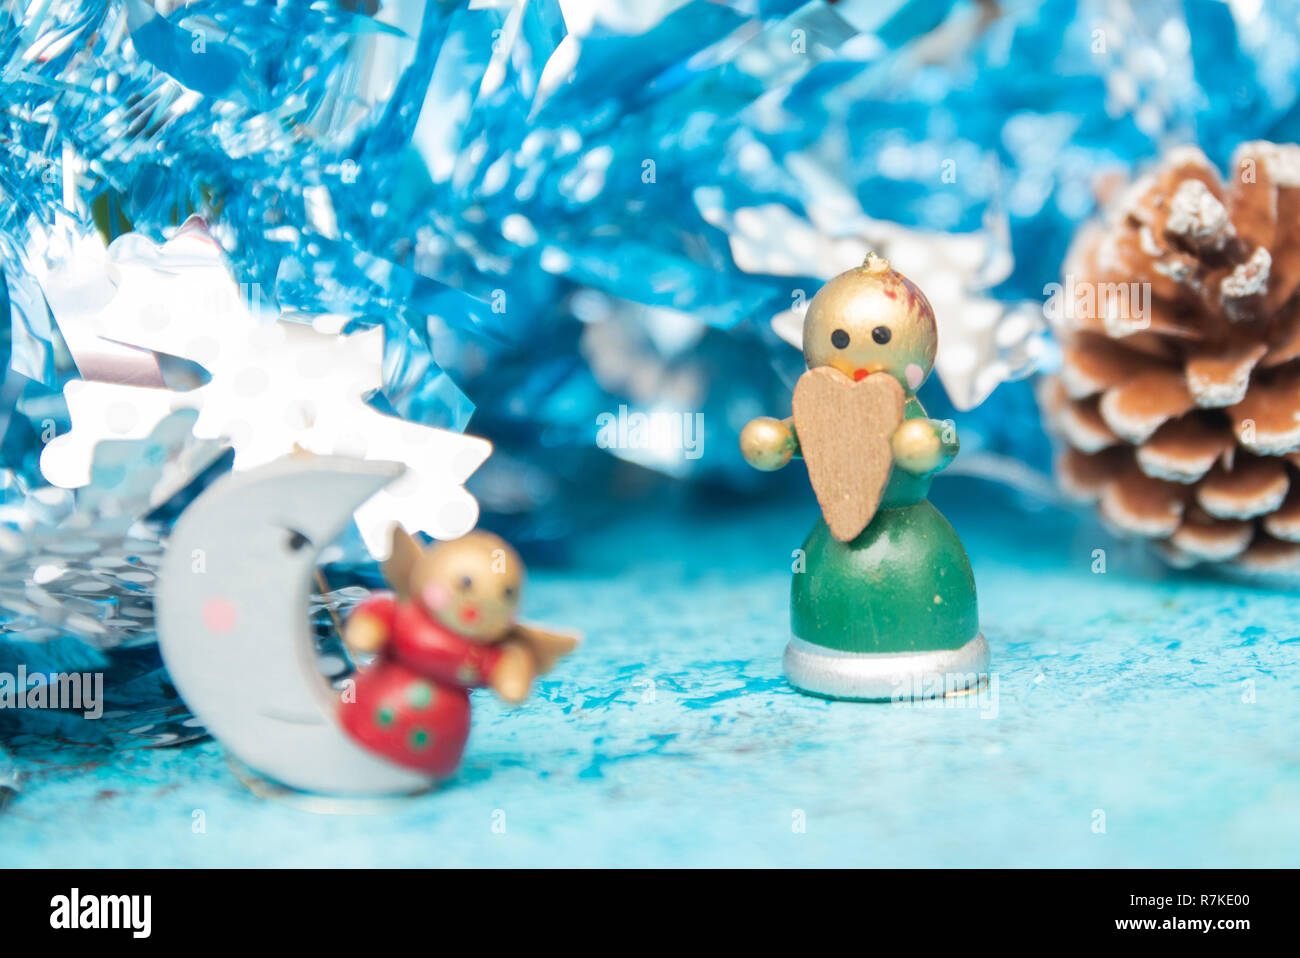 Christmas Holidays Images.Composition Christmas Holidays Christmas Toys On A Blue